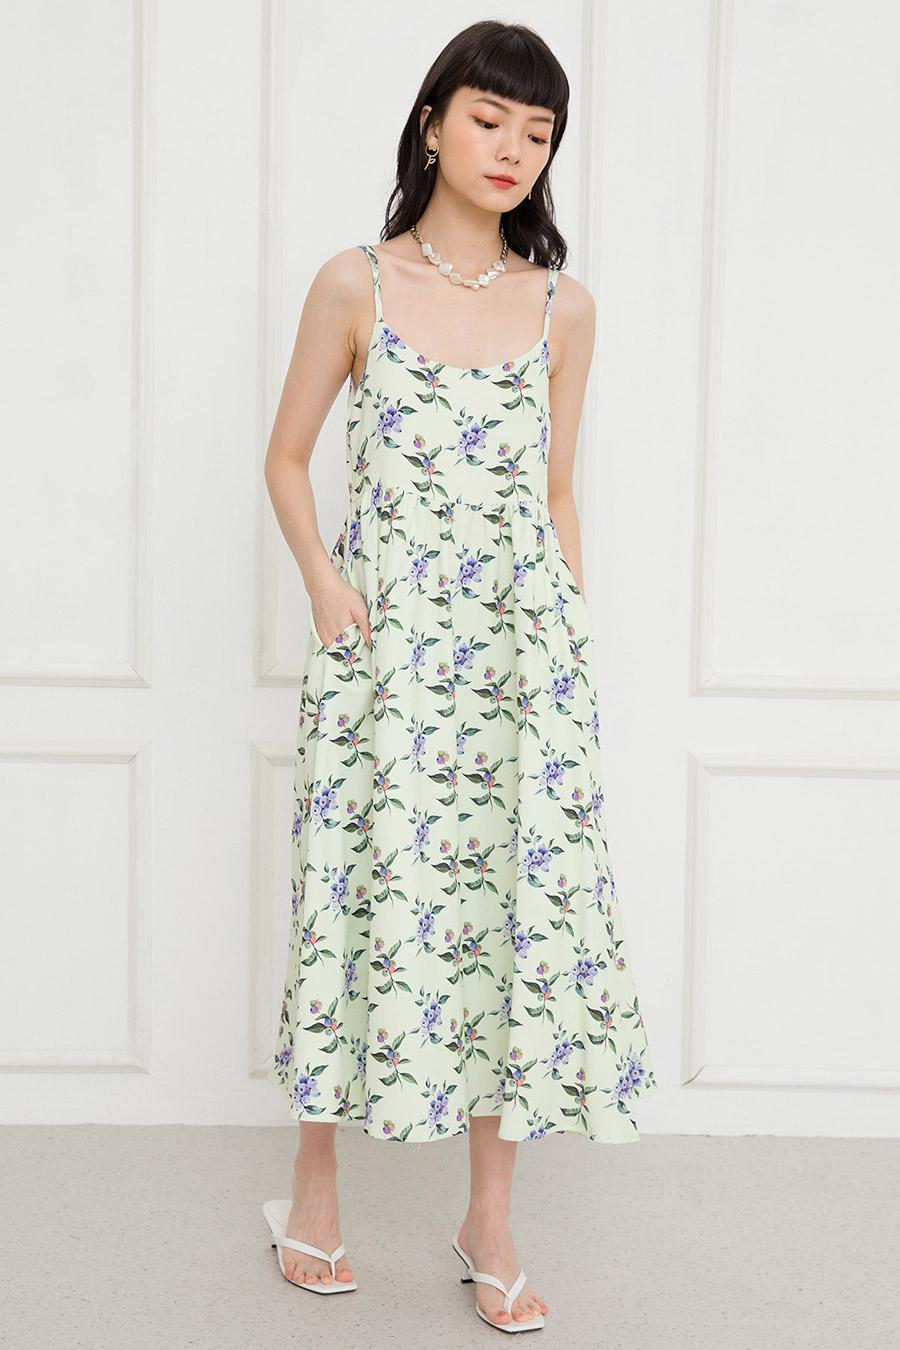 SARA DRESS - BERRIES [BY MODPARADE]